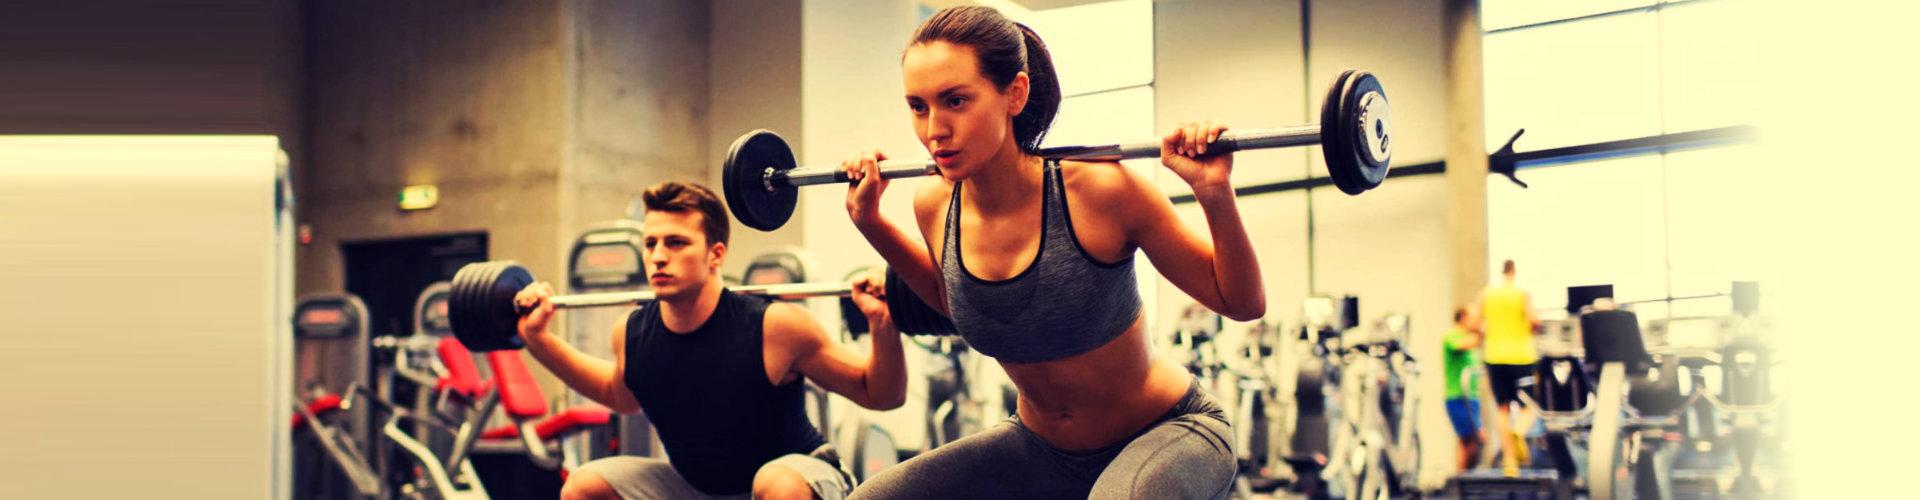 woman on a workout